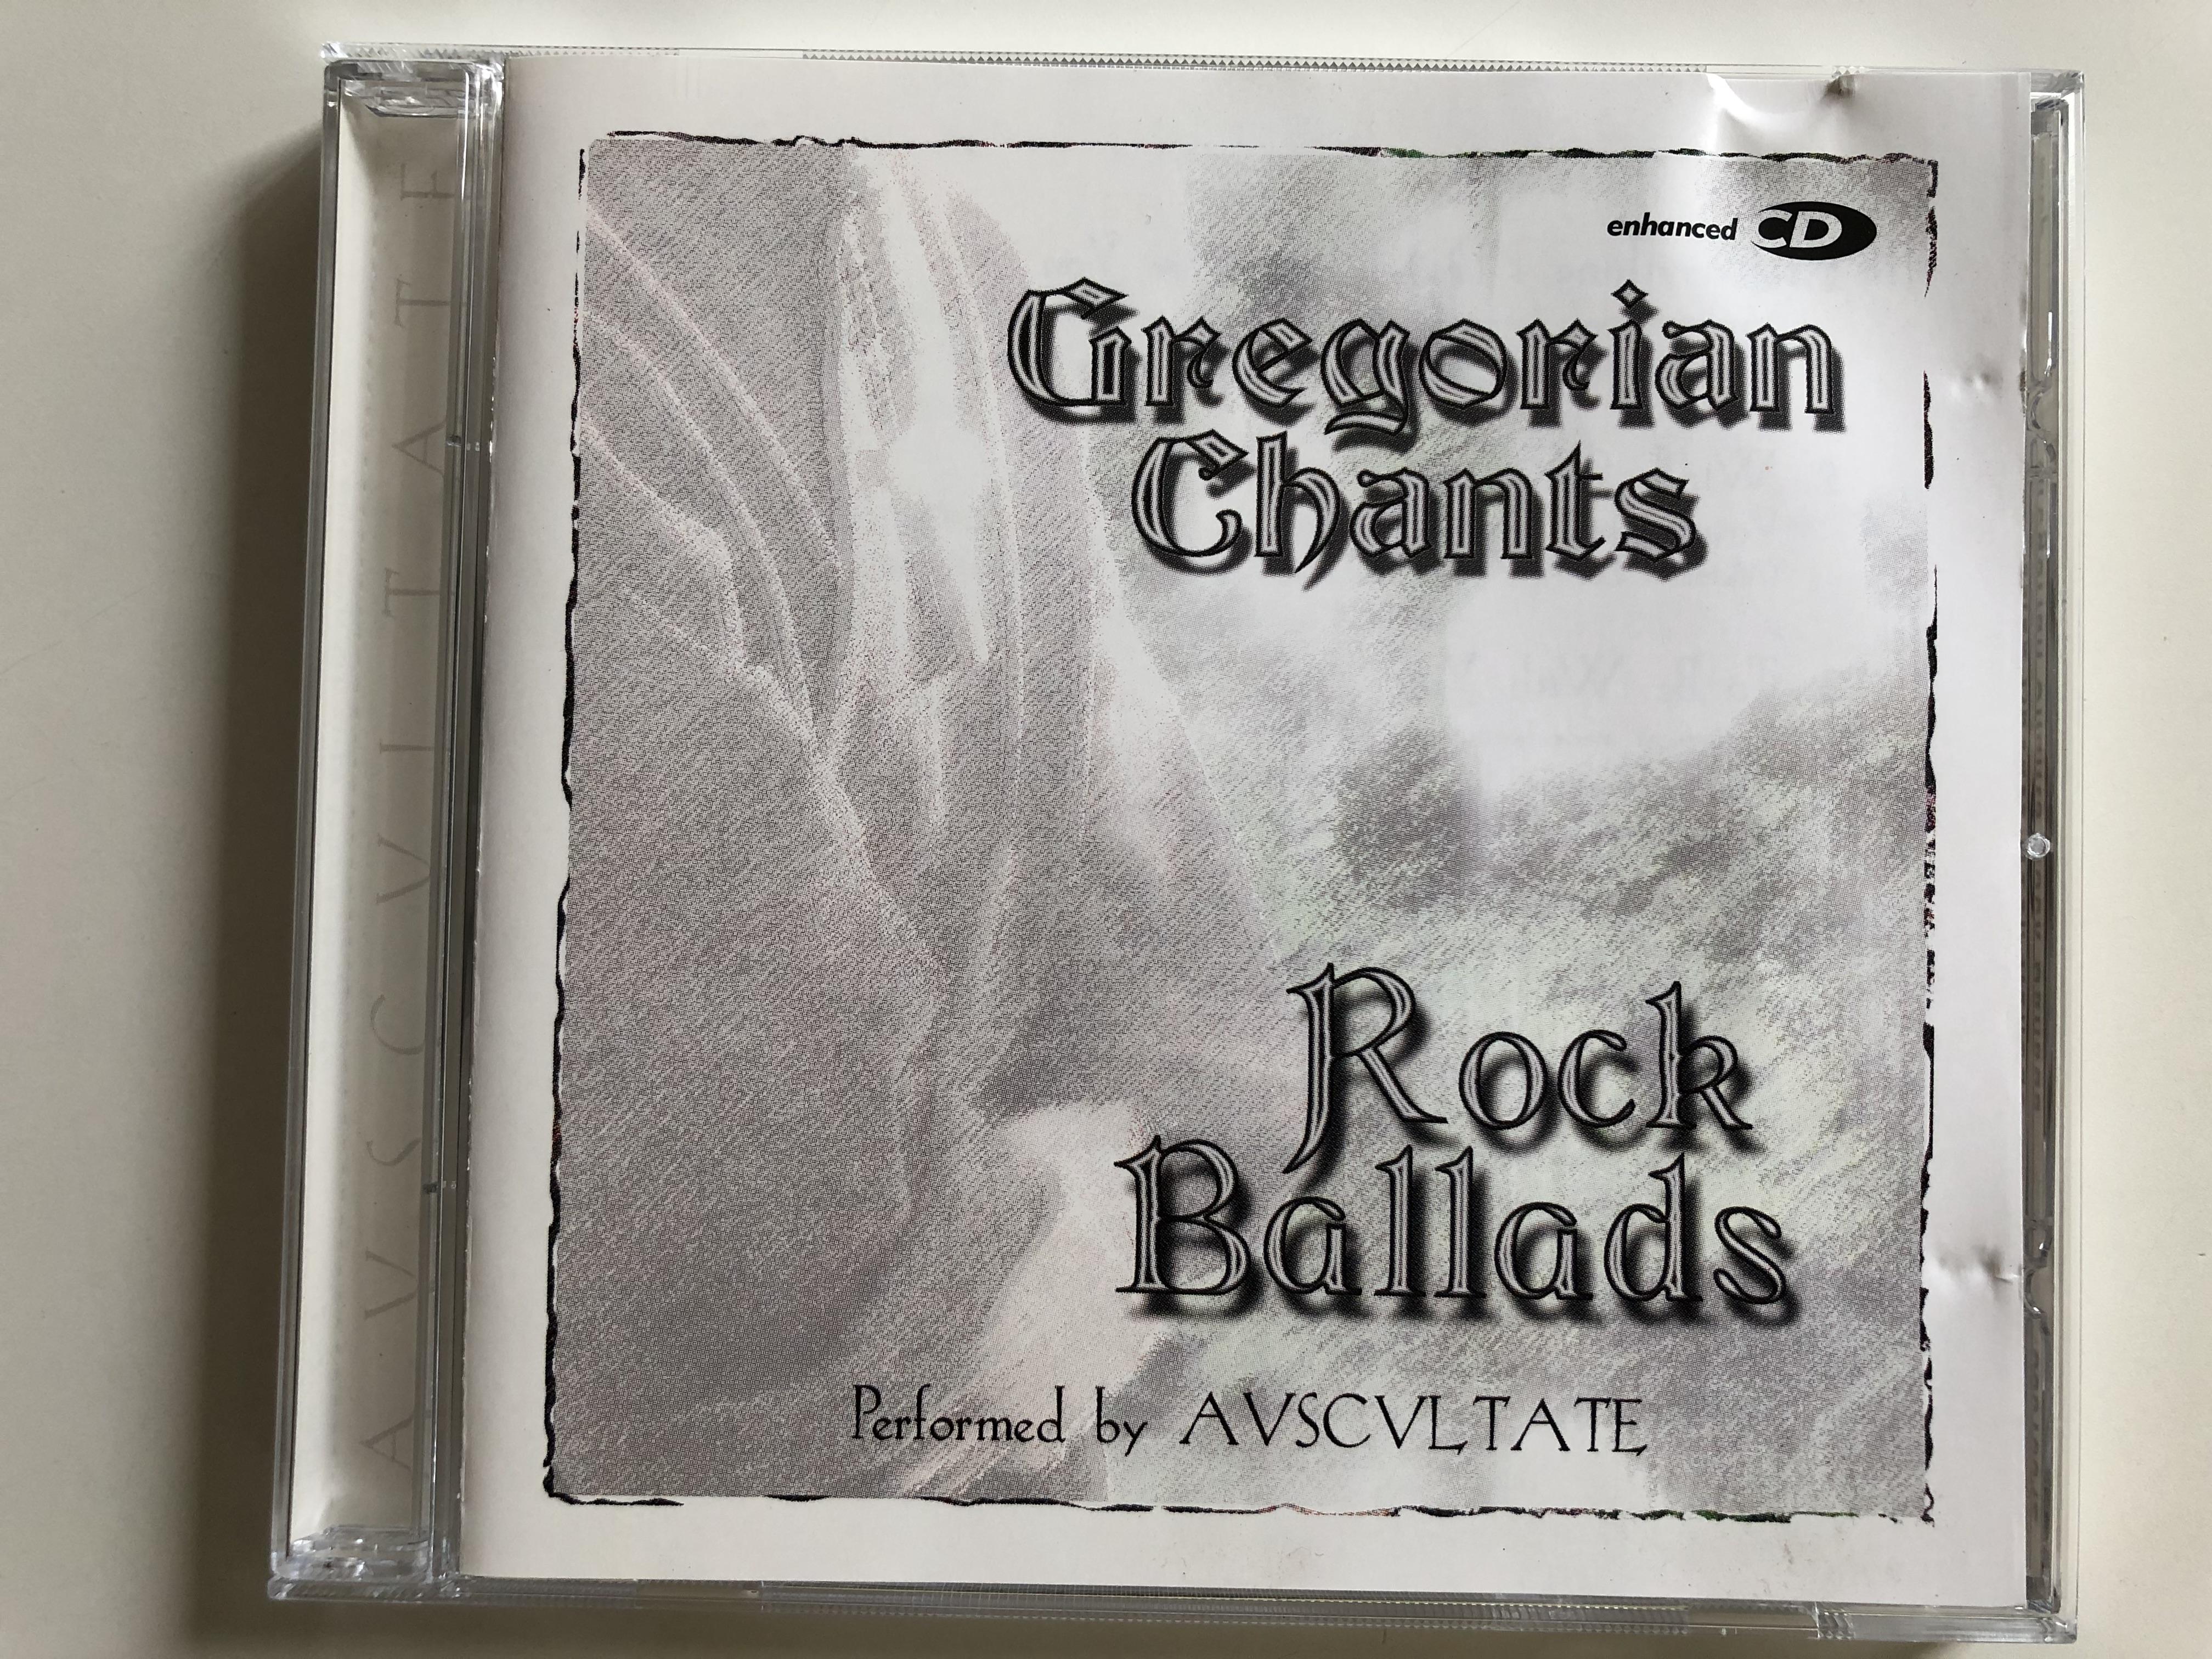 gregorian-chants-rock-ballads-performed-by-avscvltate-enhanced-cd-audio-cd-2001-elap-music-1-.jpg